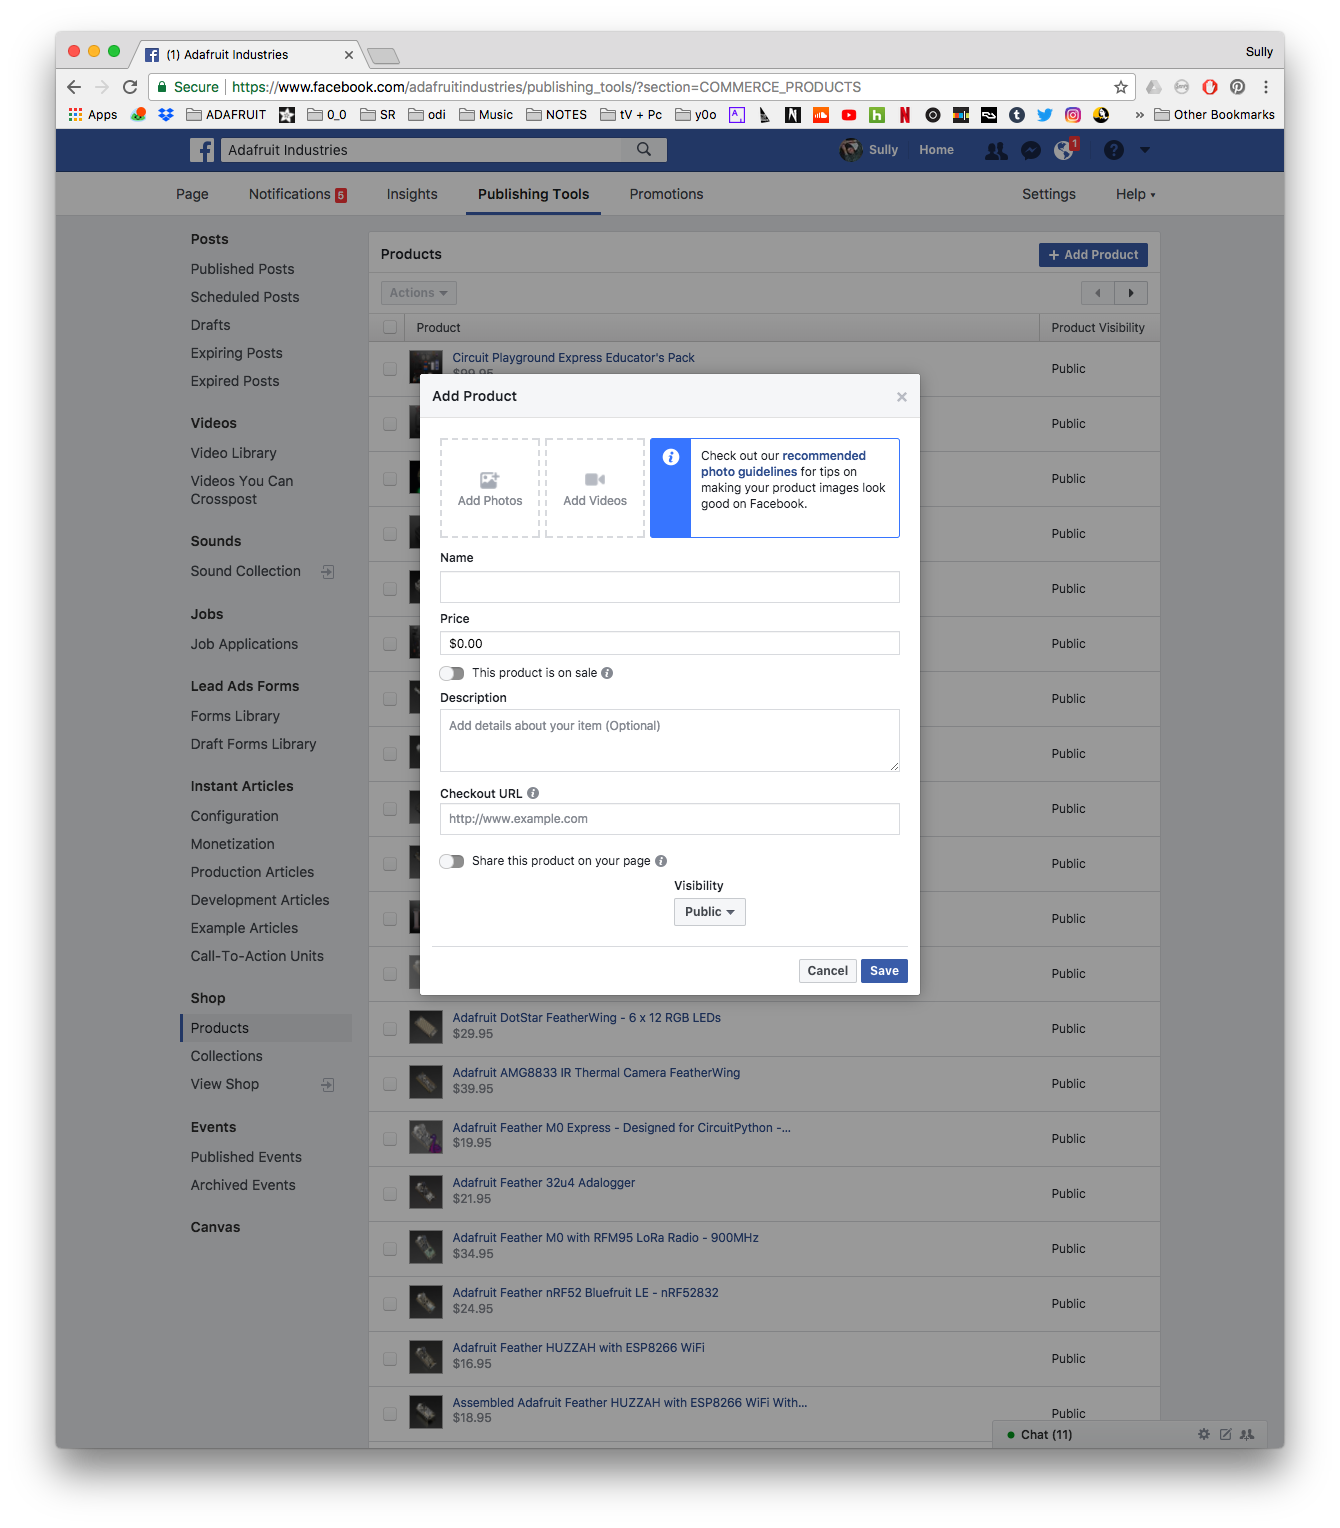 adafruit_products_Screen_Shot_2017-12-15_at_3.53.34_PM.png